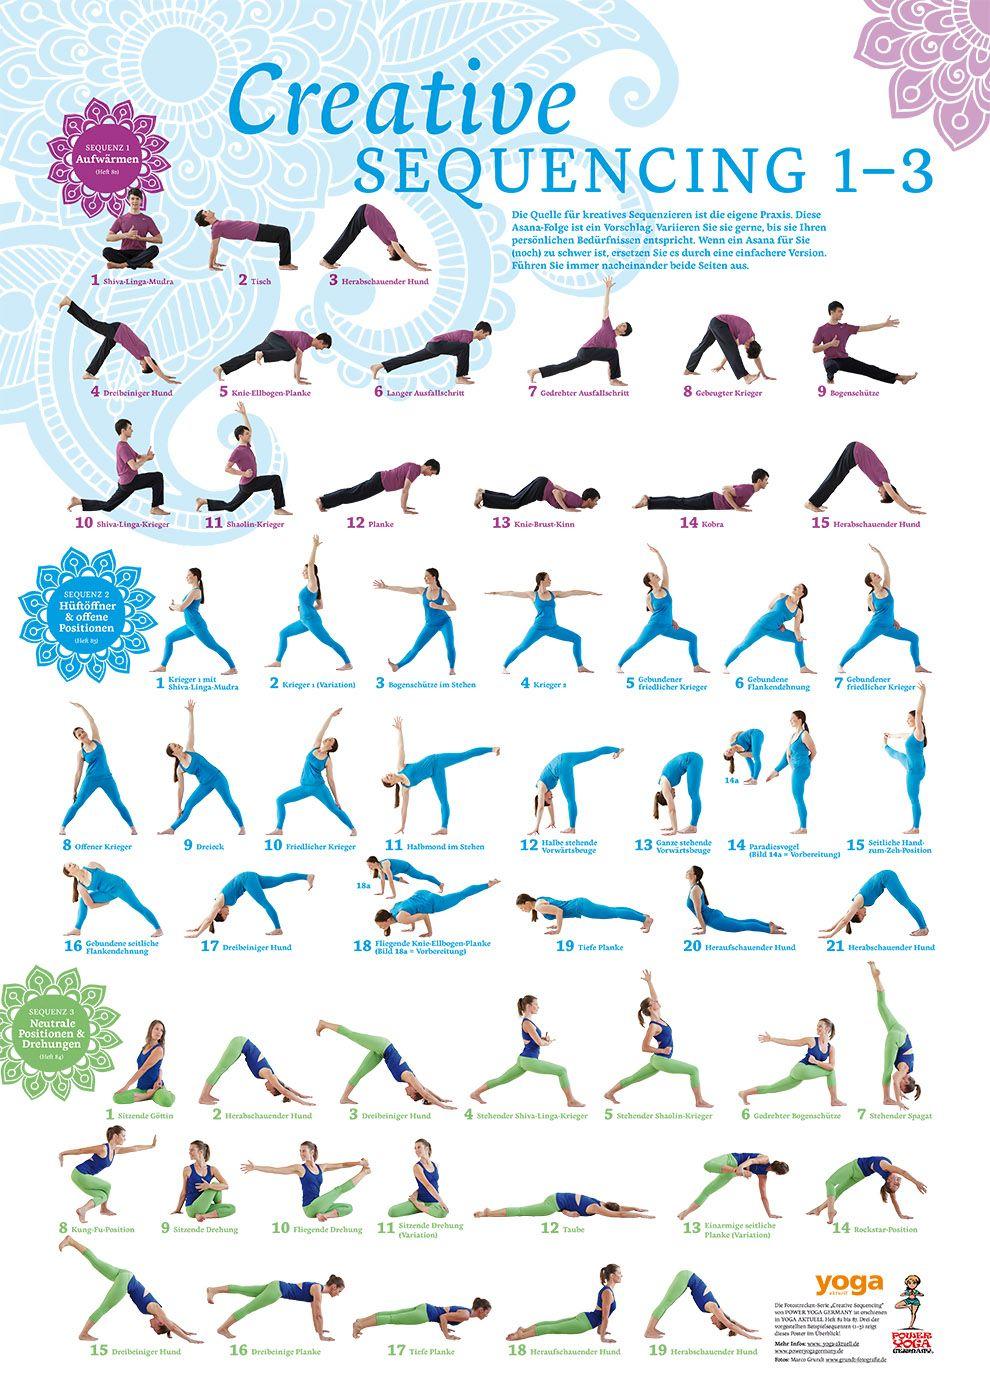 YOGISHOP | Creative Sequencing 1-3 Poster von Yoga Aktuell | Yoga, Yogamatten & Yoga-Zubehör